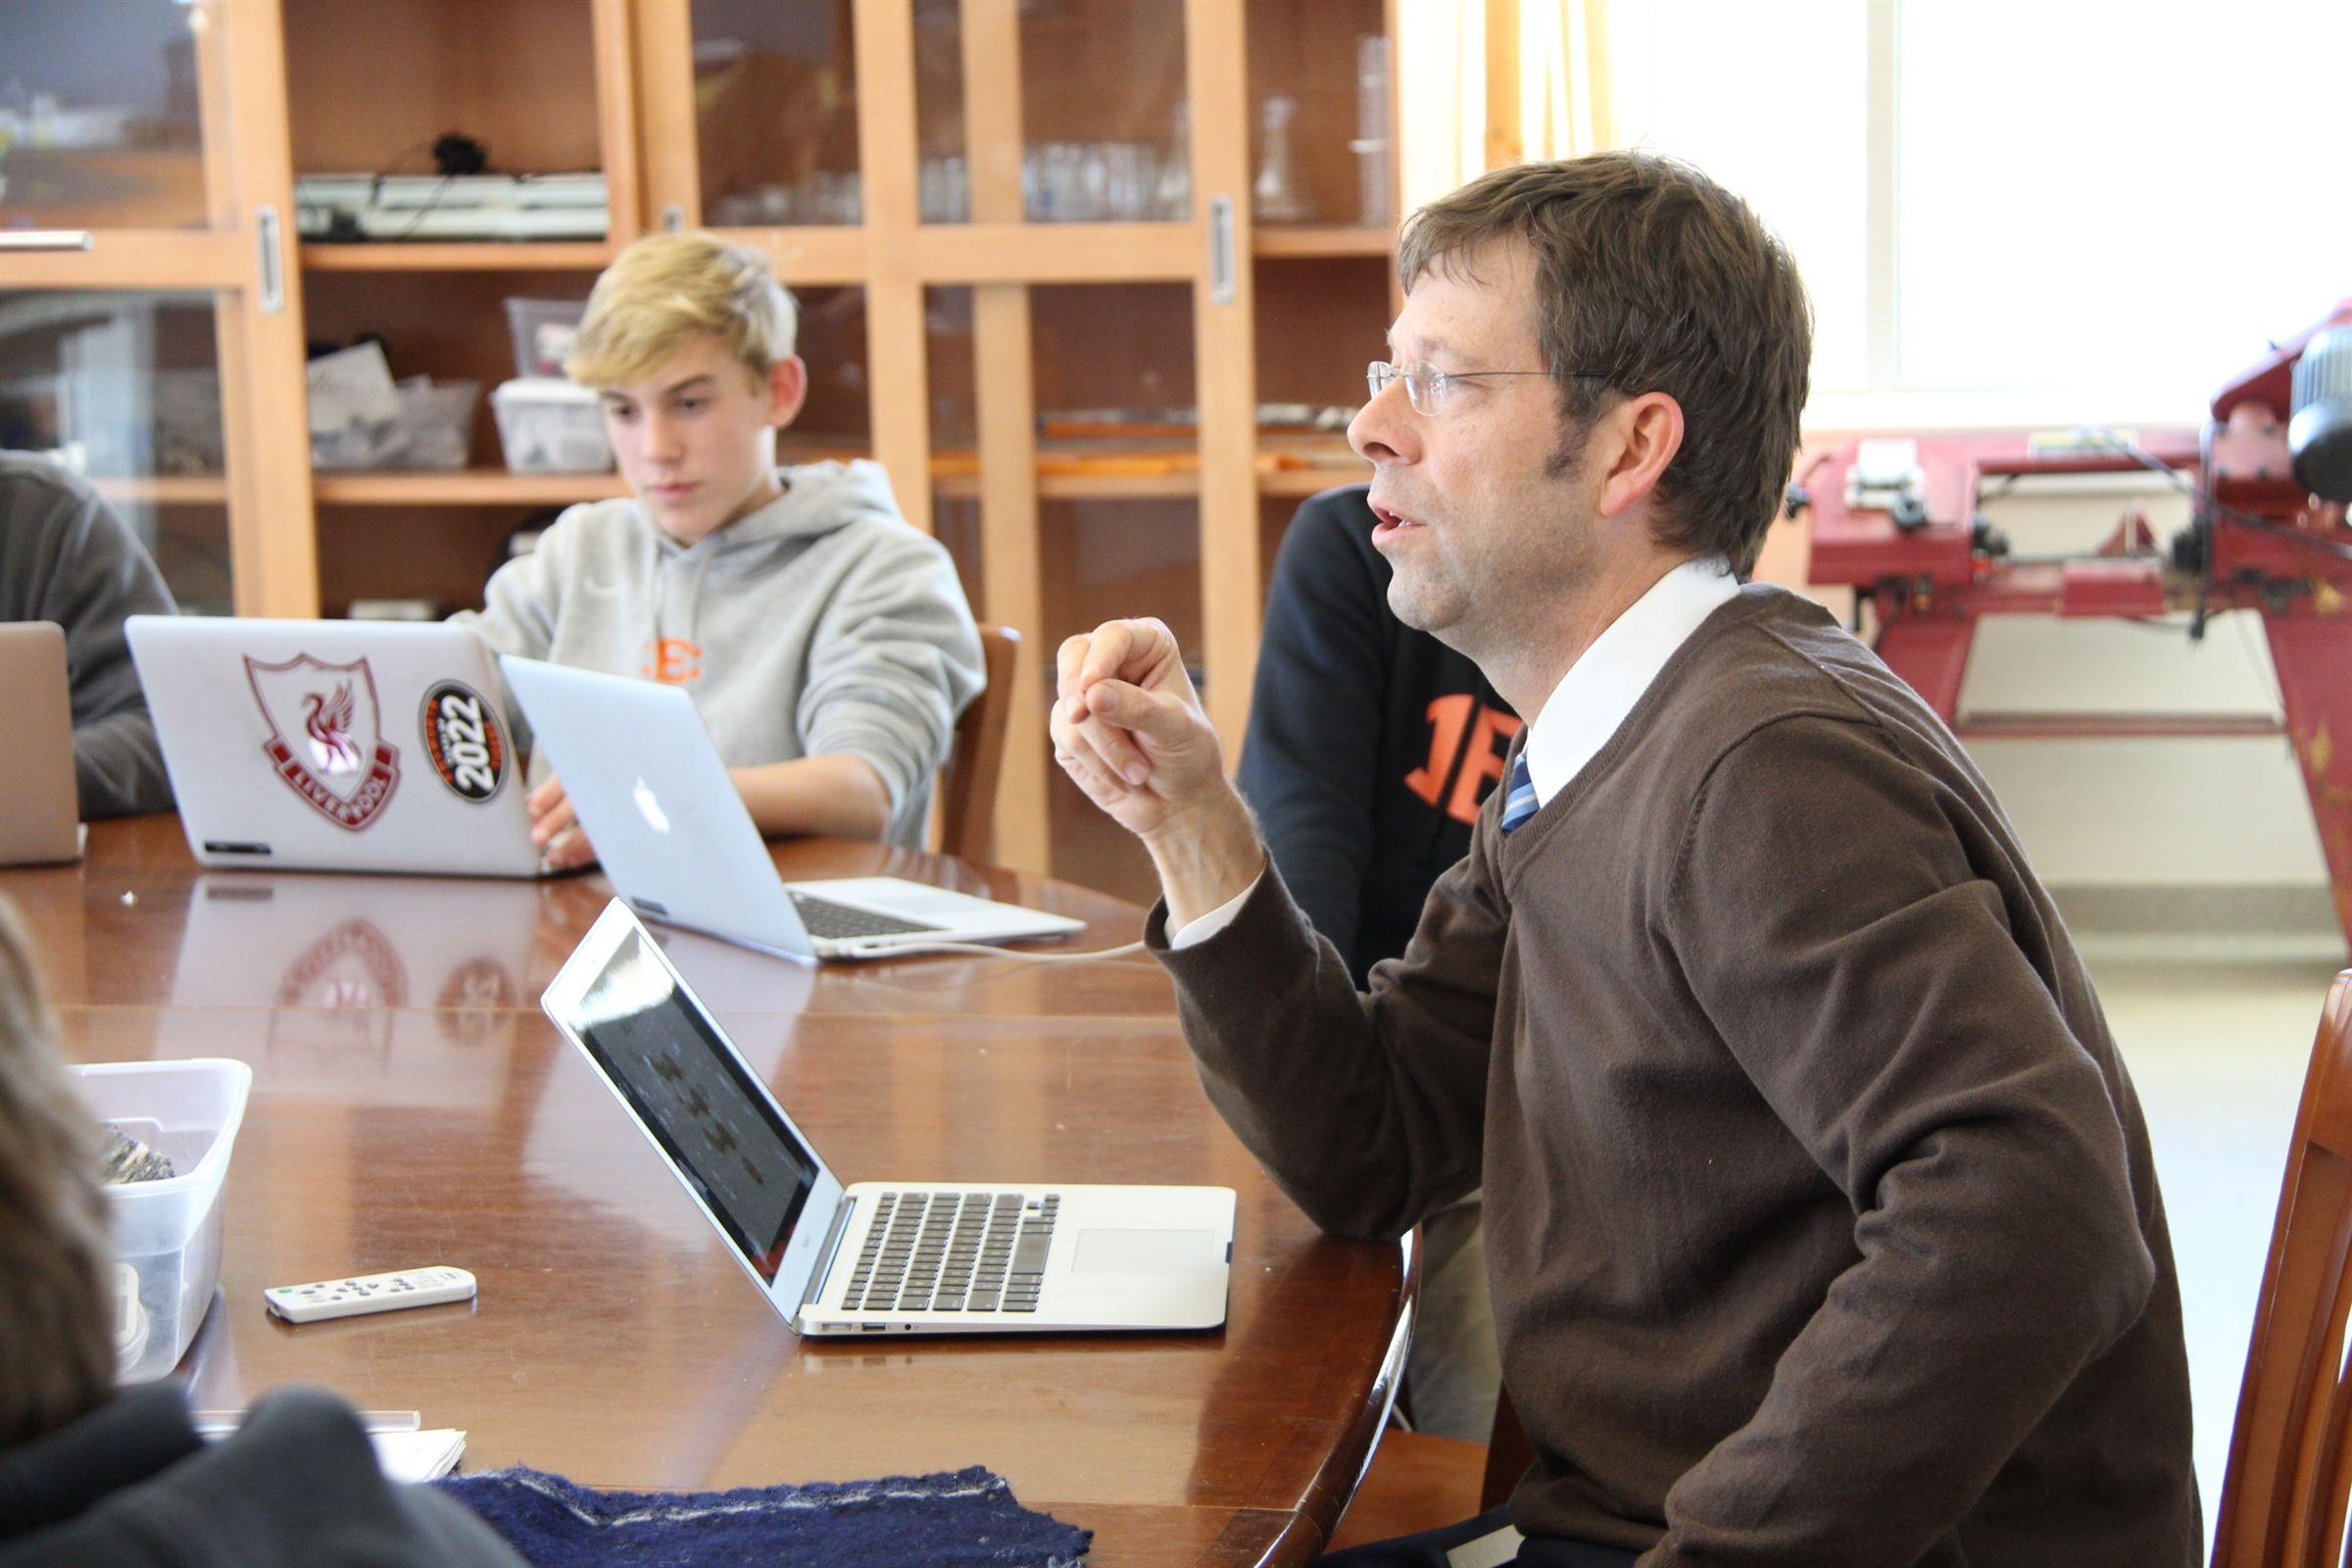 Chris Thompson teaching science